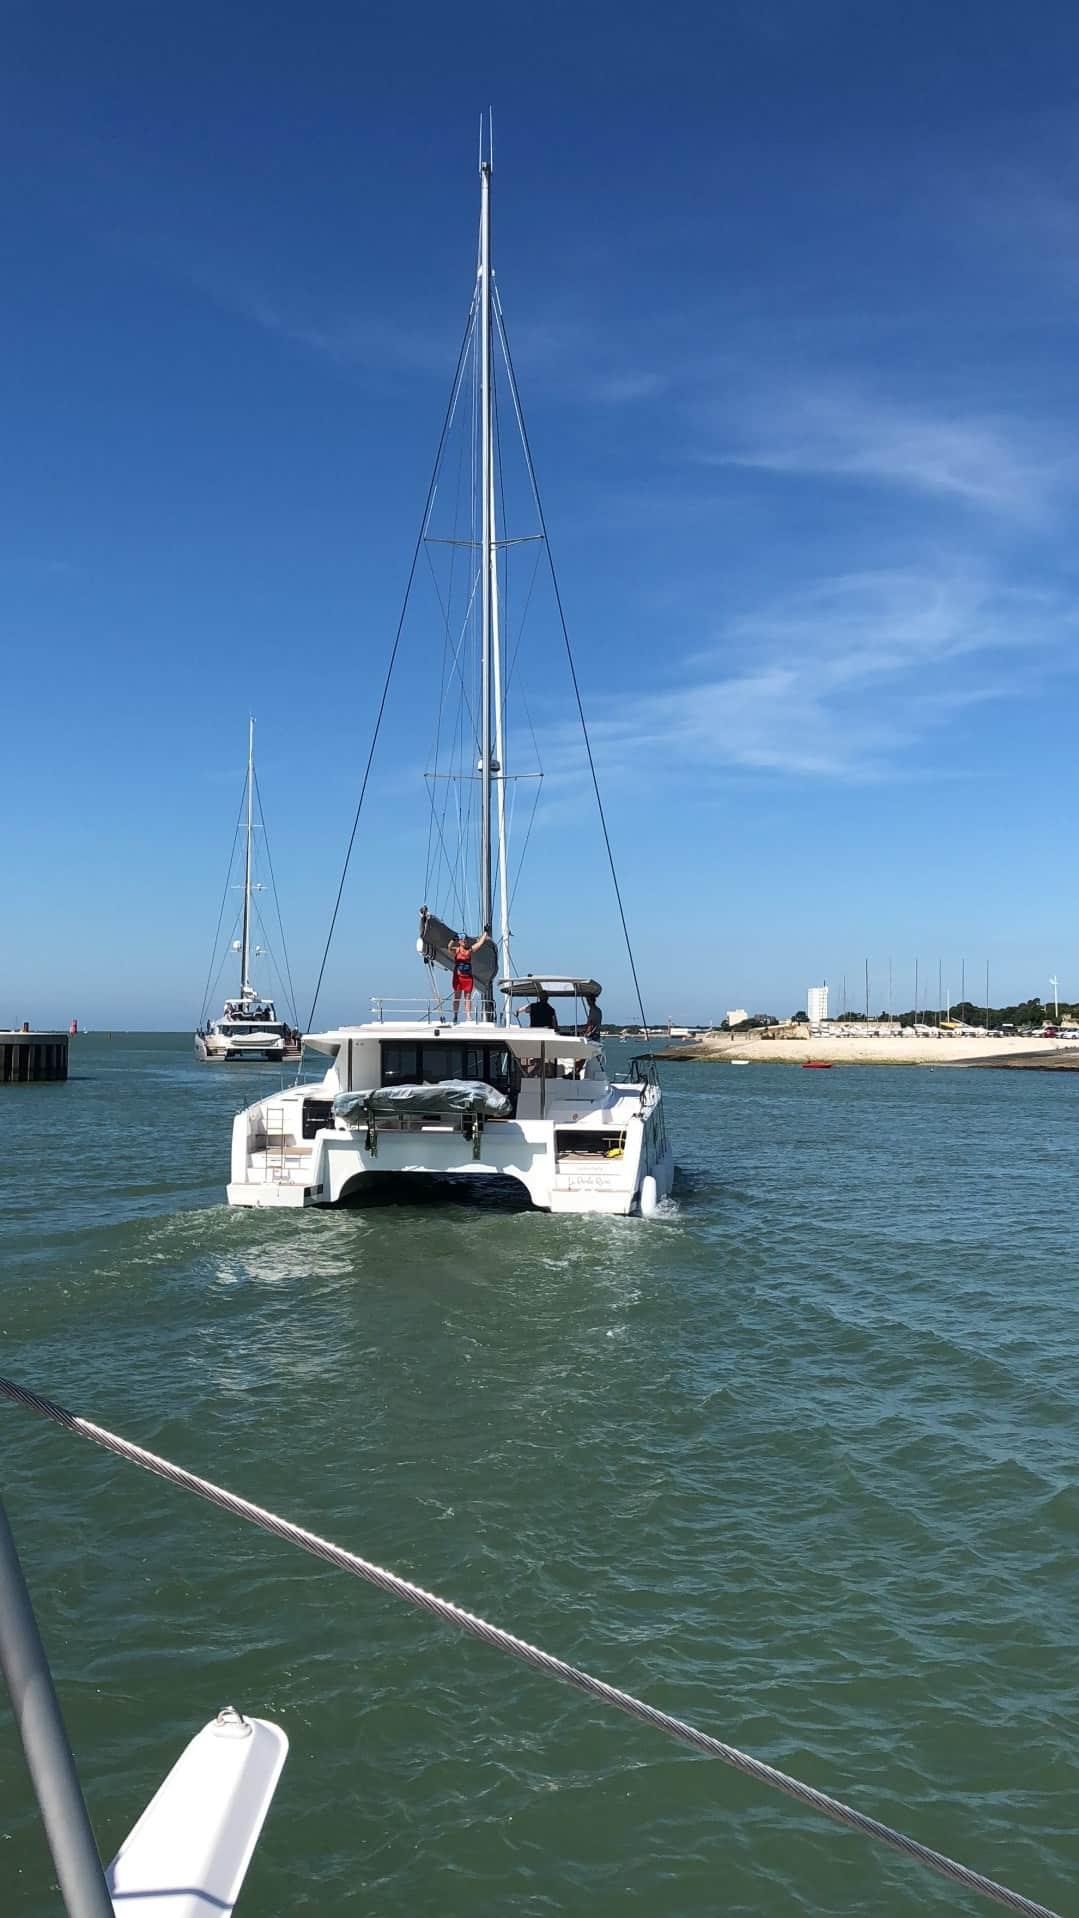 Isabelle sailing her boat